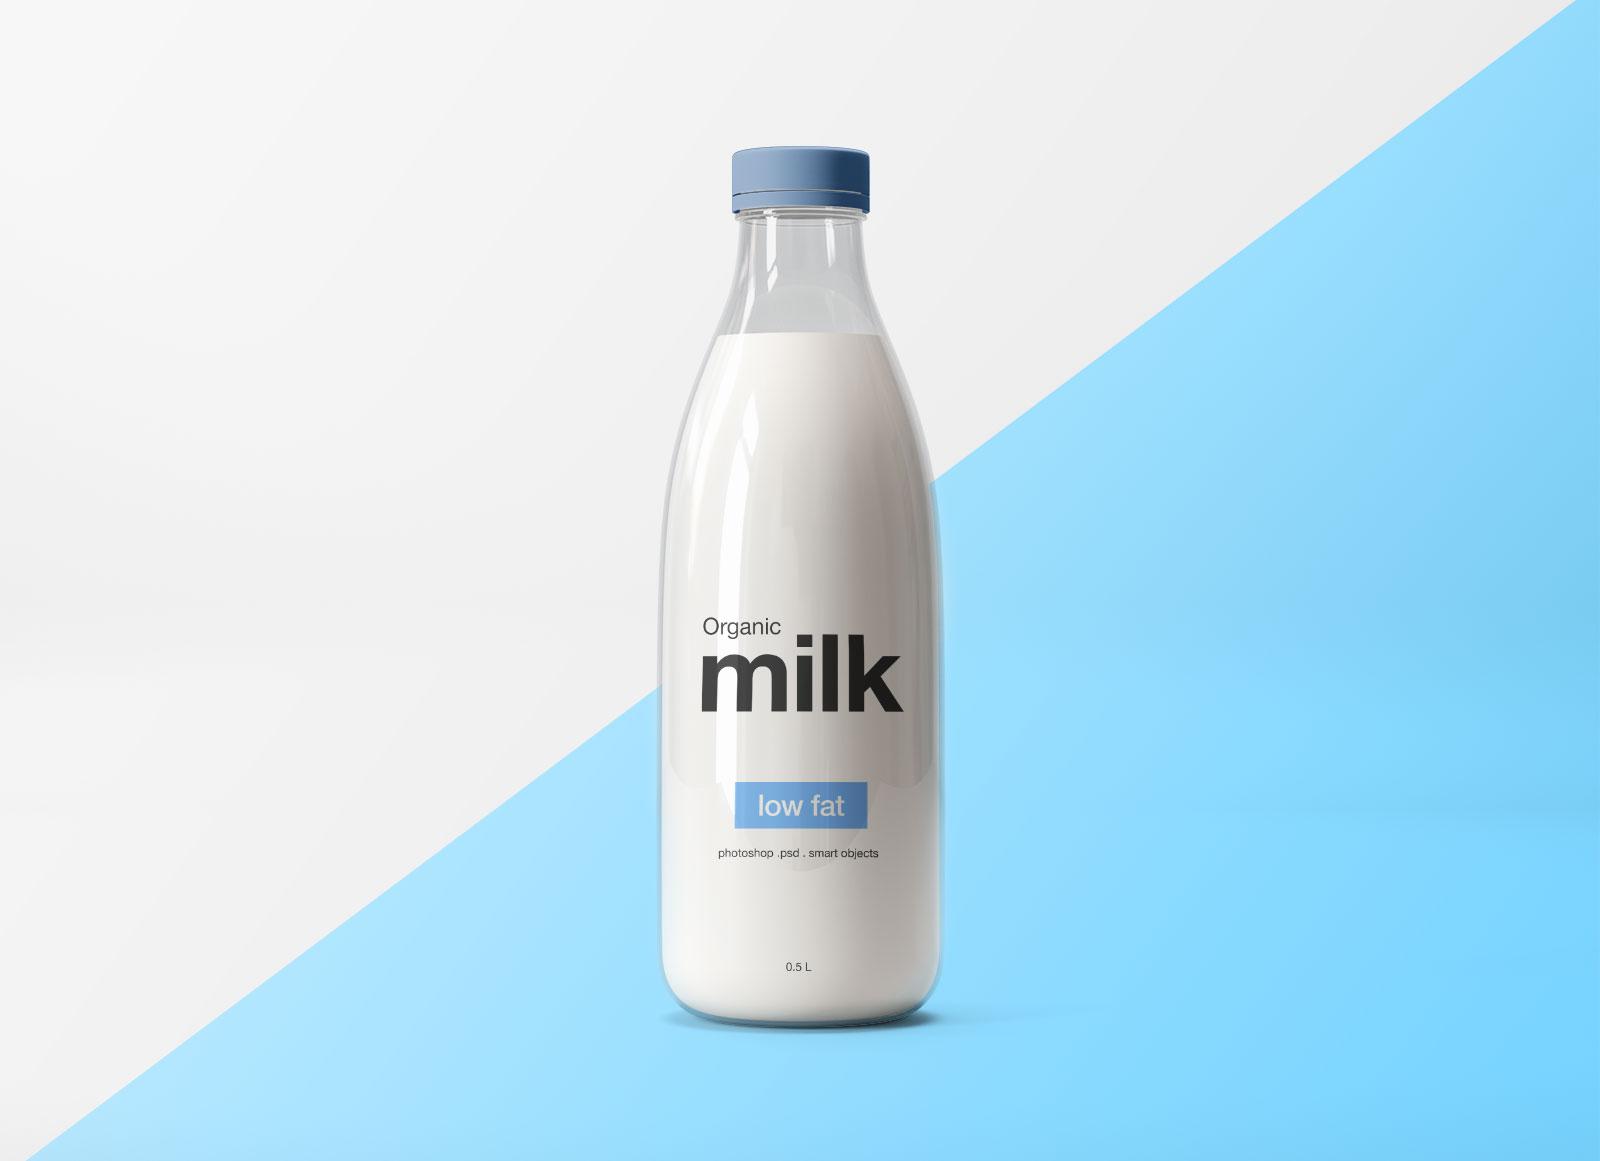 Free-Glass-Milk-Bottle-Mockup-PSD-File